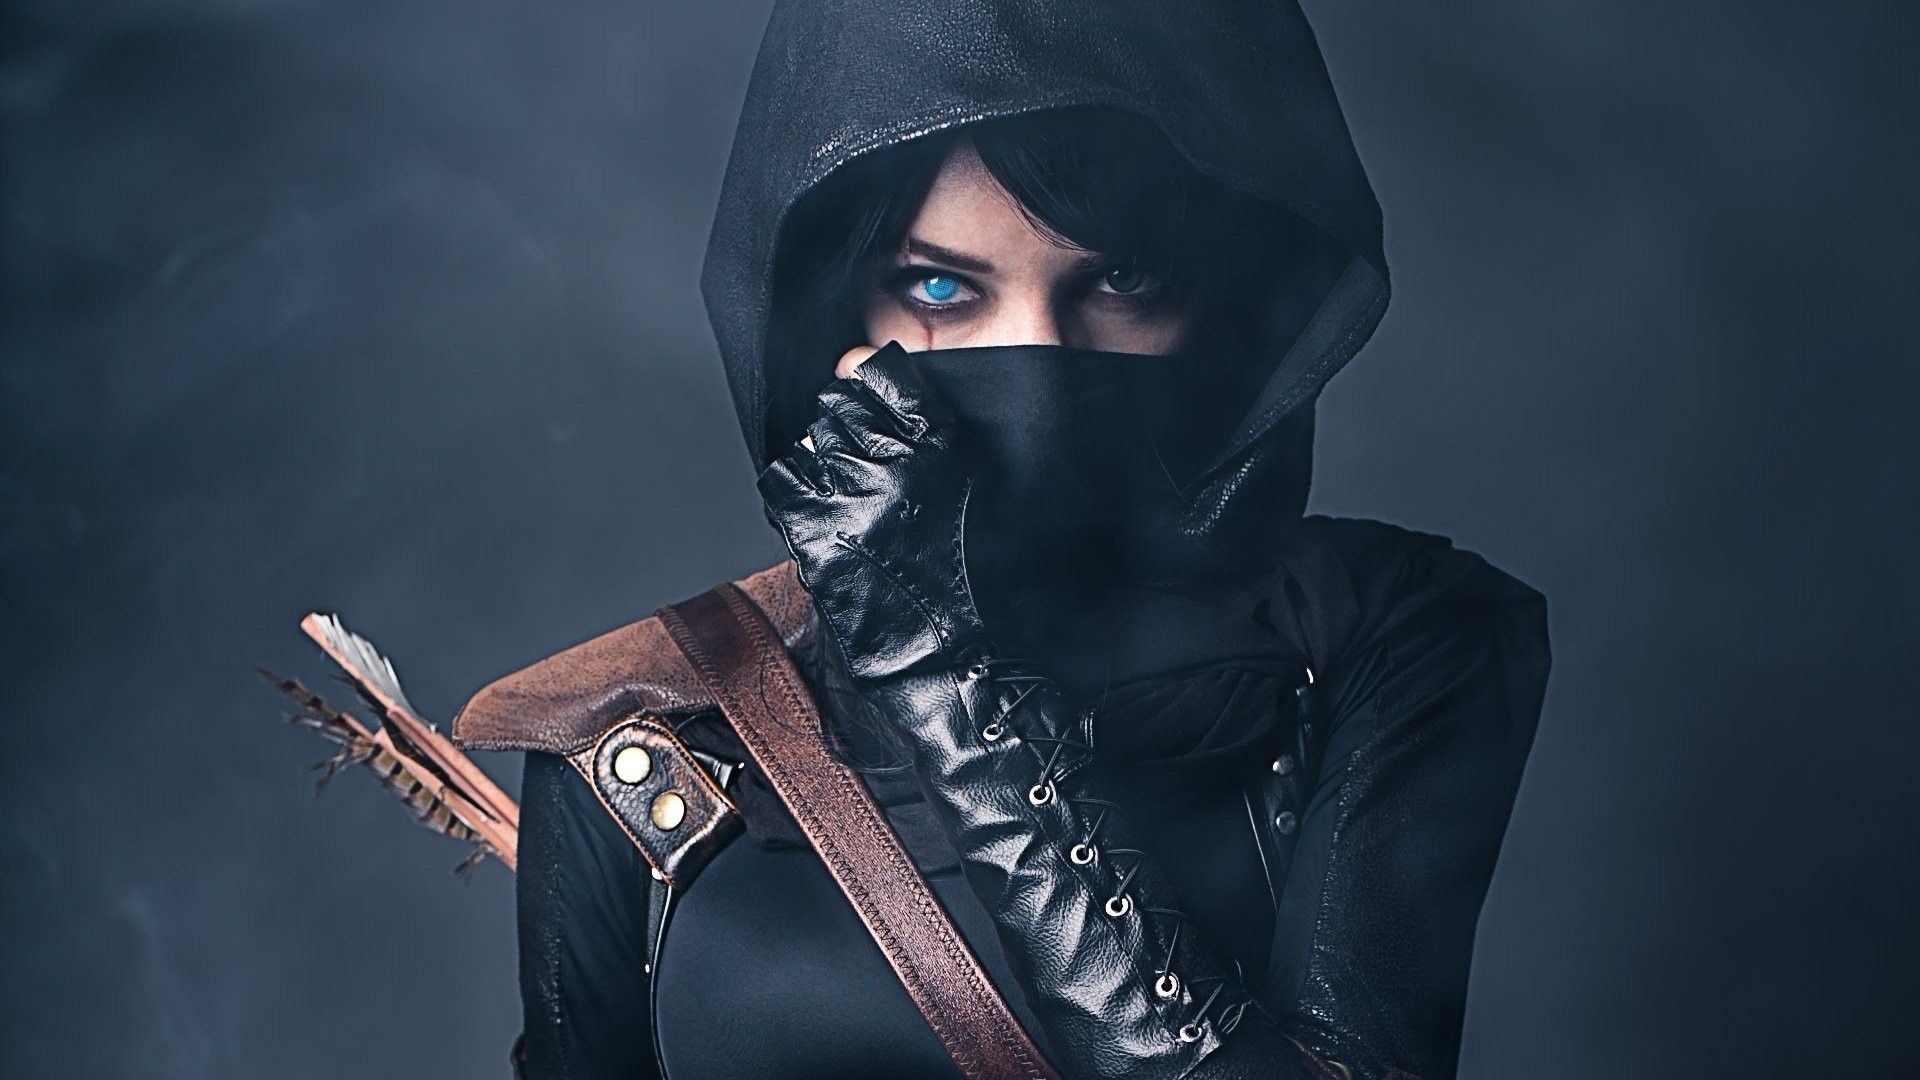 Female Ninja Wallpapers Top Free Female Ninja Backgrounds Wallpaperaccess